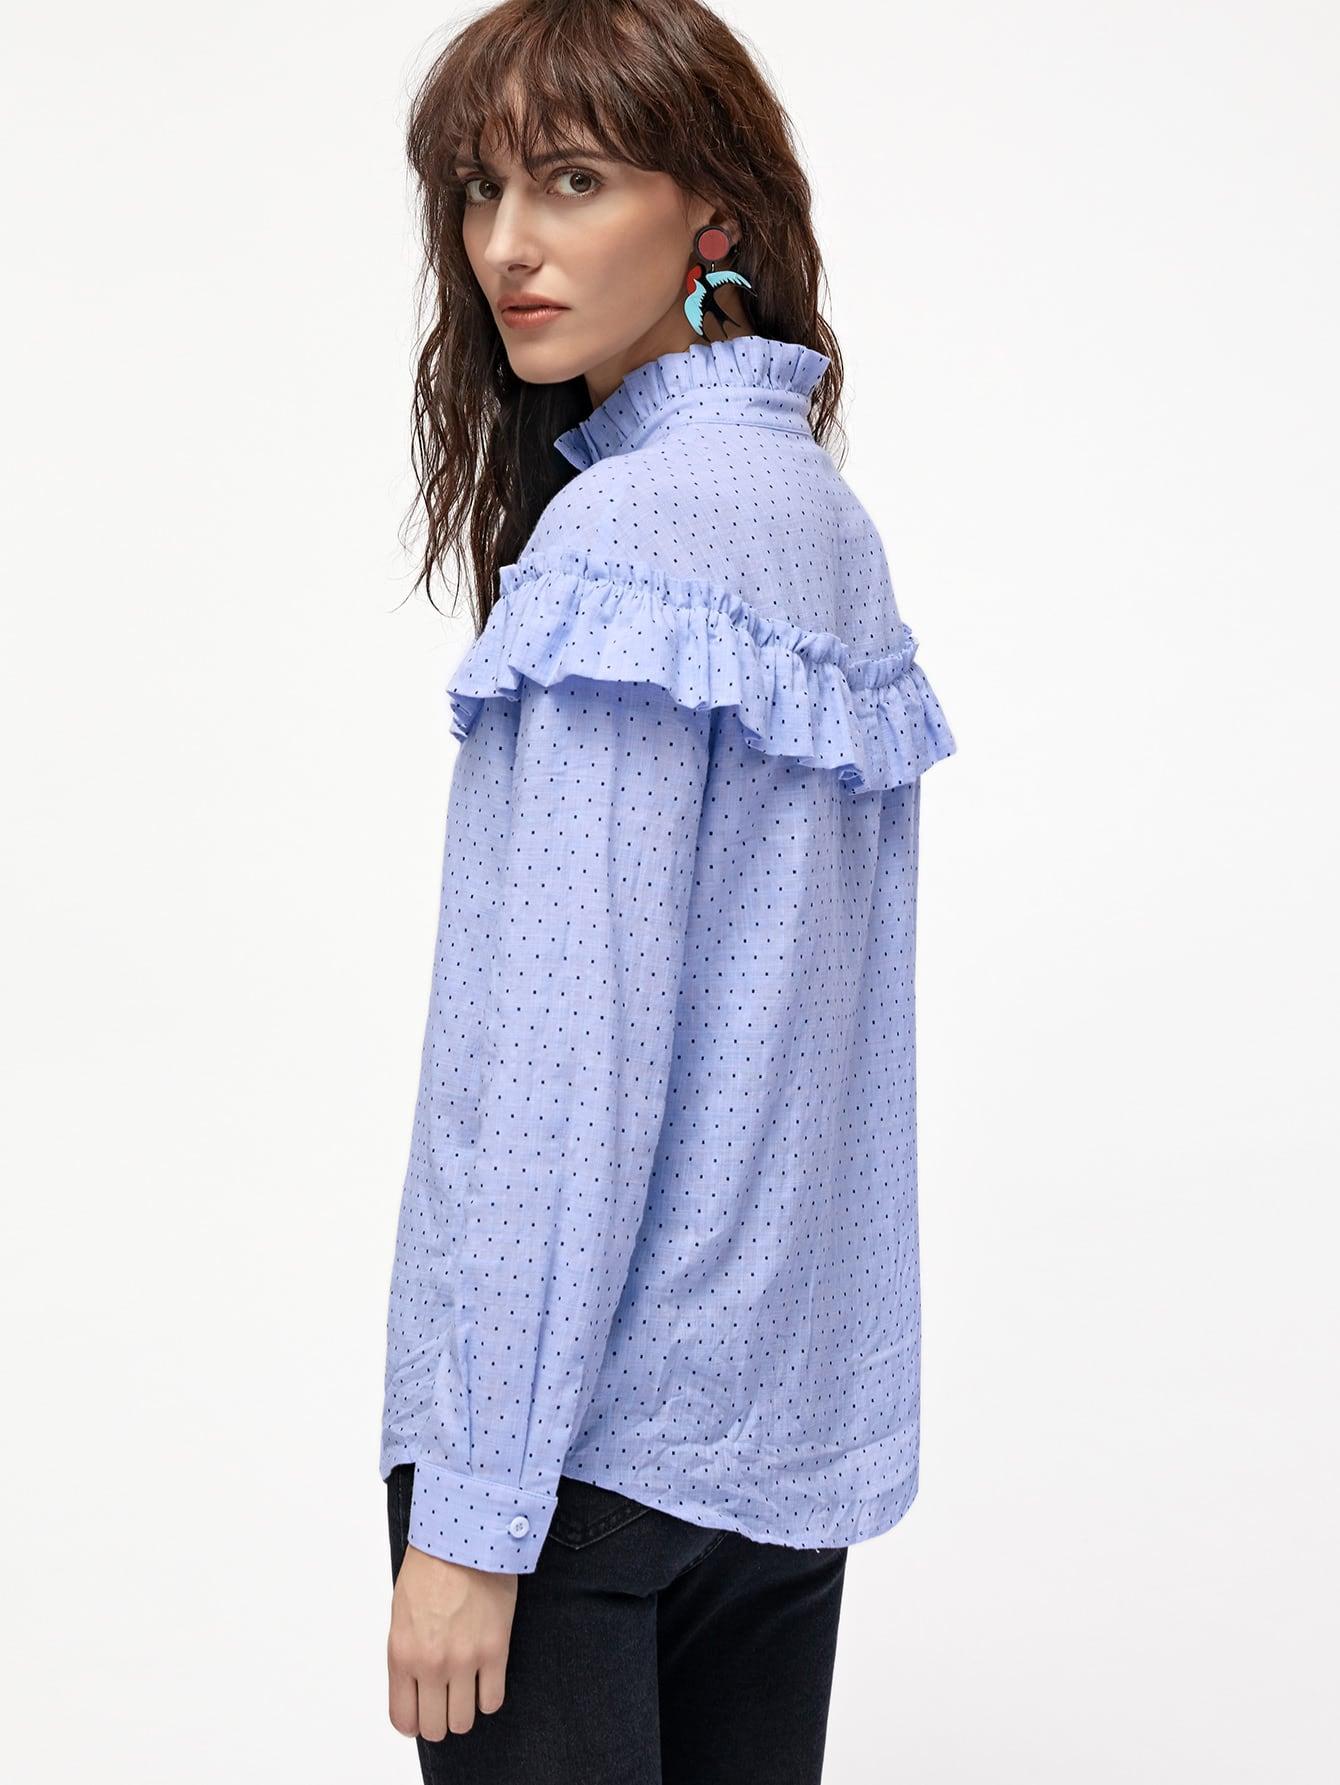 blouse161129704_2